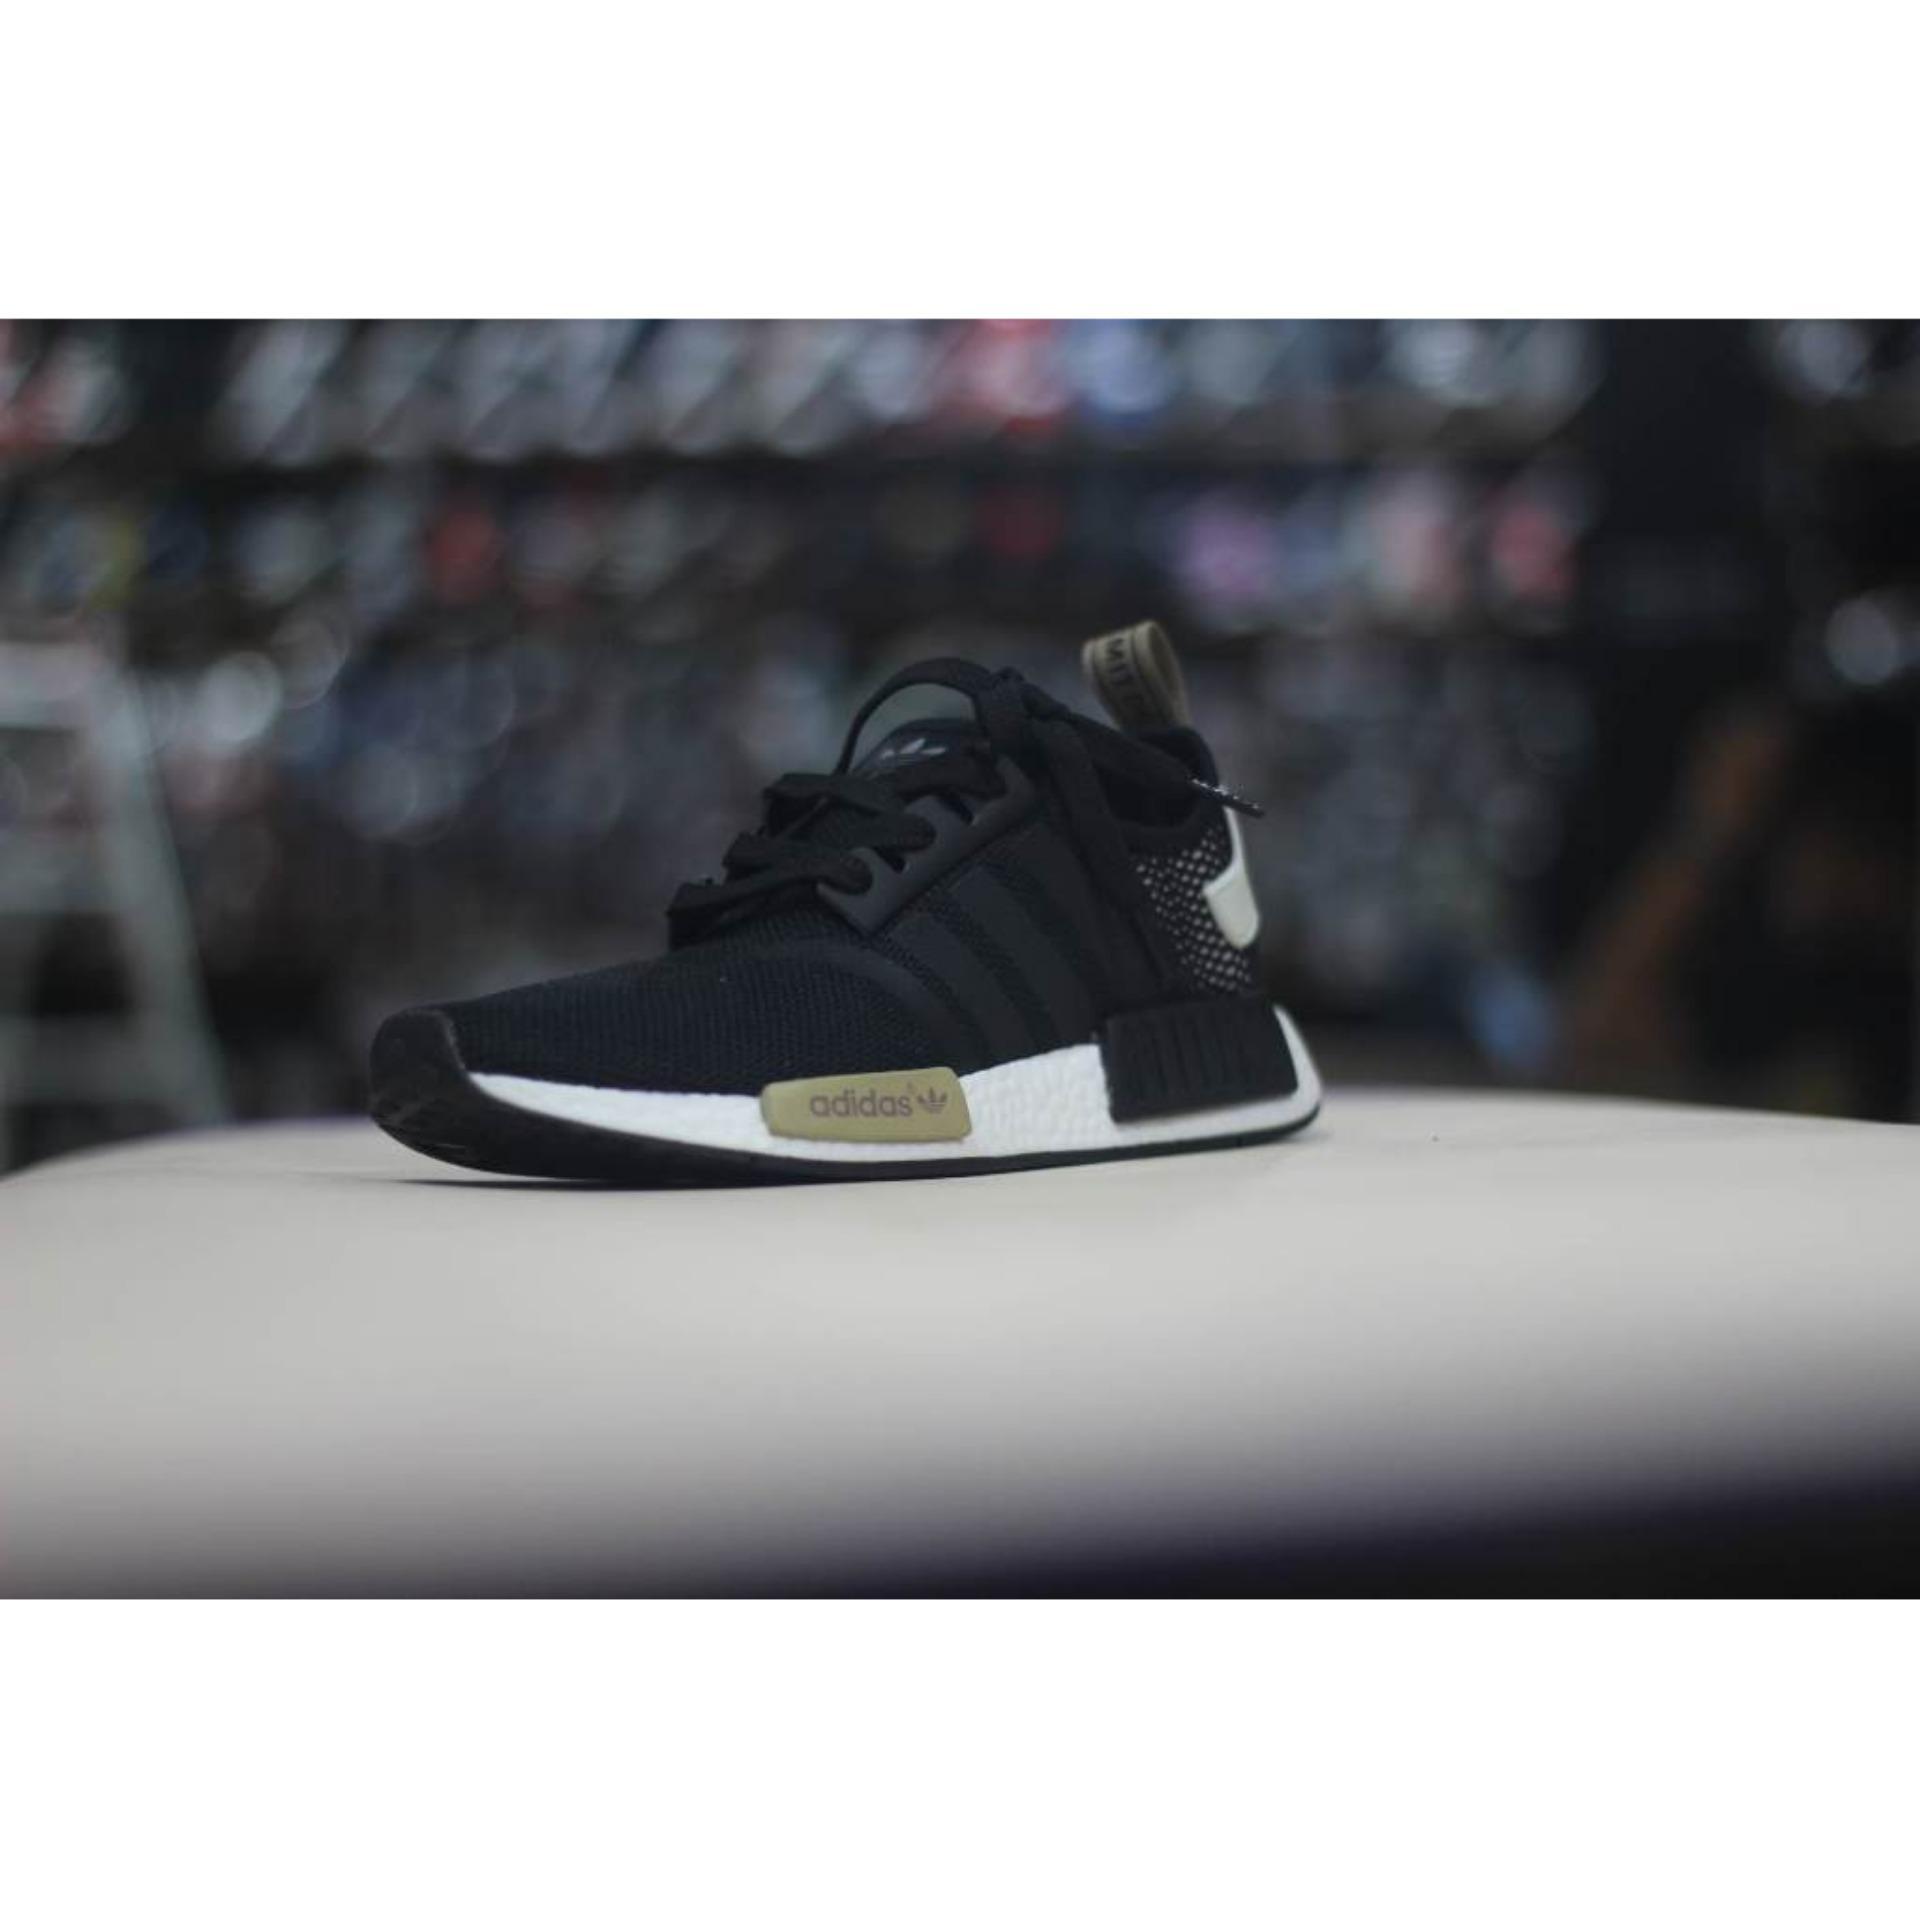 aa1dce6c8 Cek Harga Baru Gens Adidas Nmd X Gucci Bee Terkini - Situs ...